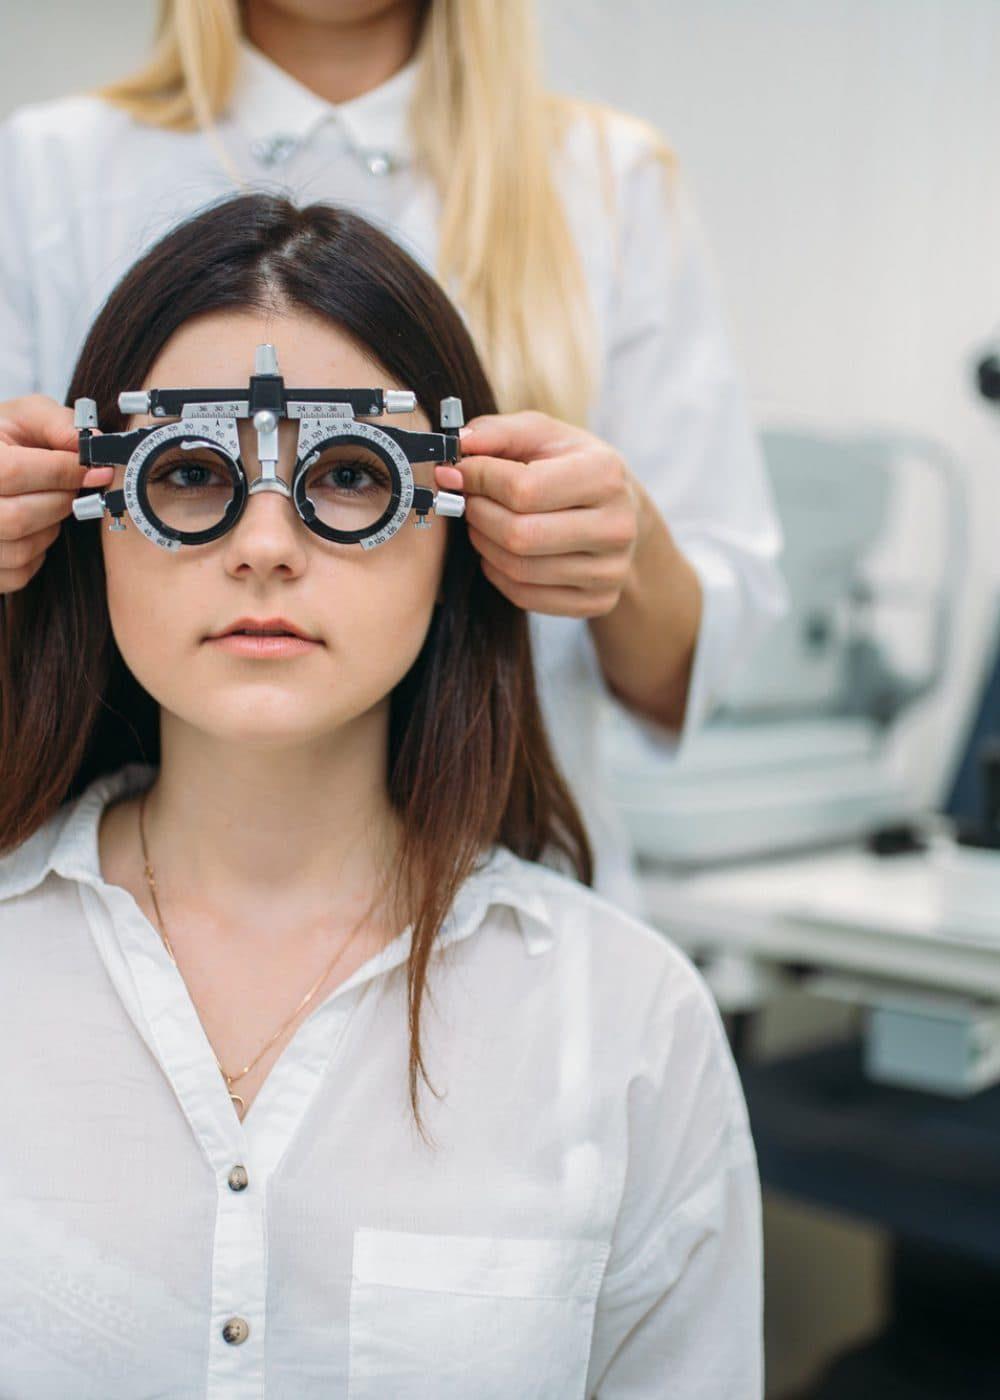 eyesight-test-optician-cabinet-vision-diagnostic-pcpj50339awot9q0ekp20as4tziw59t1nv97av1zg0-pichi@2x